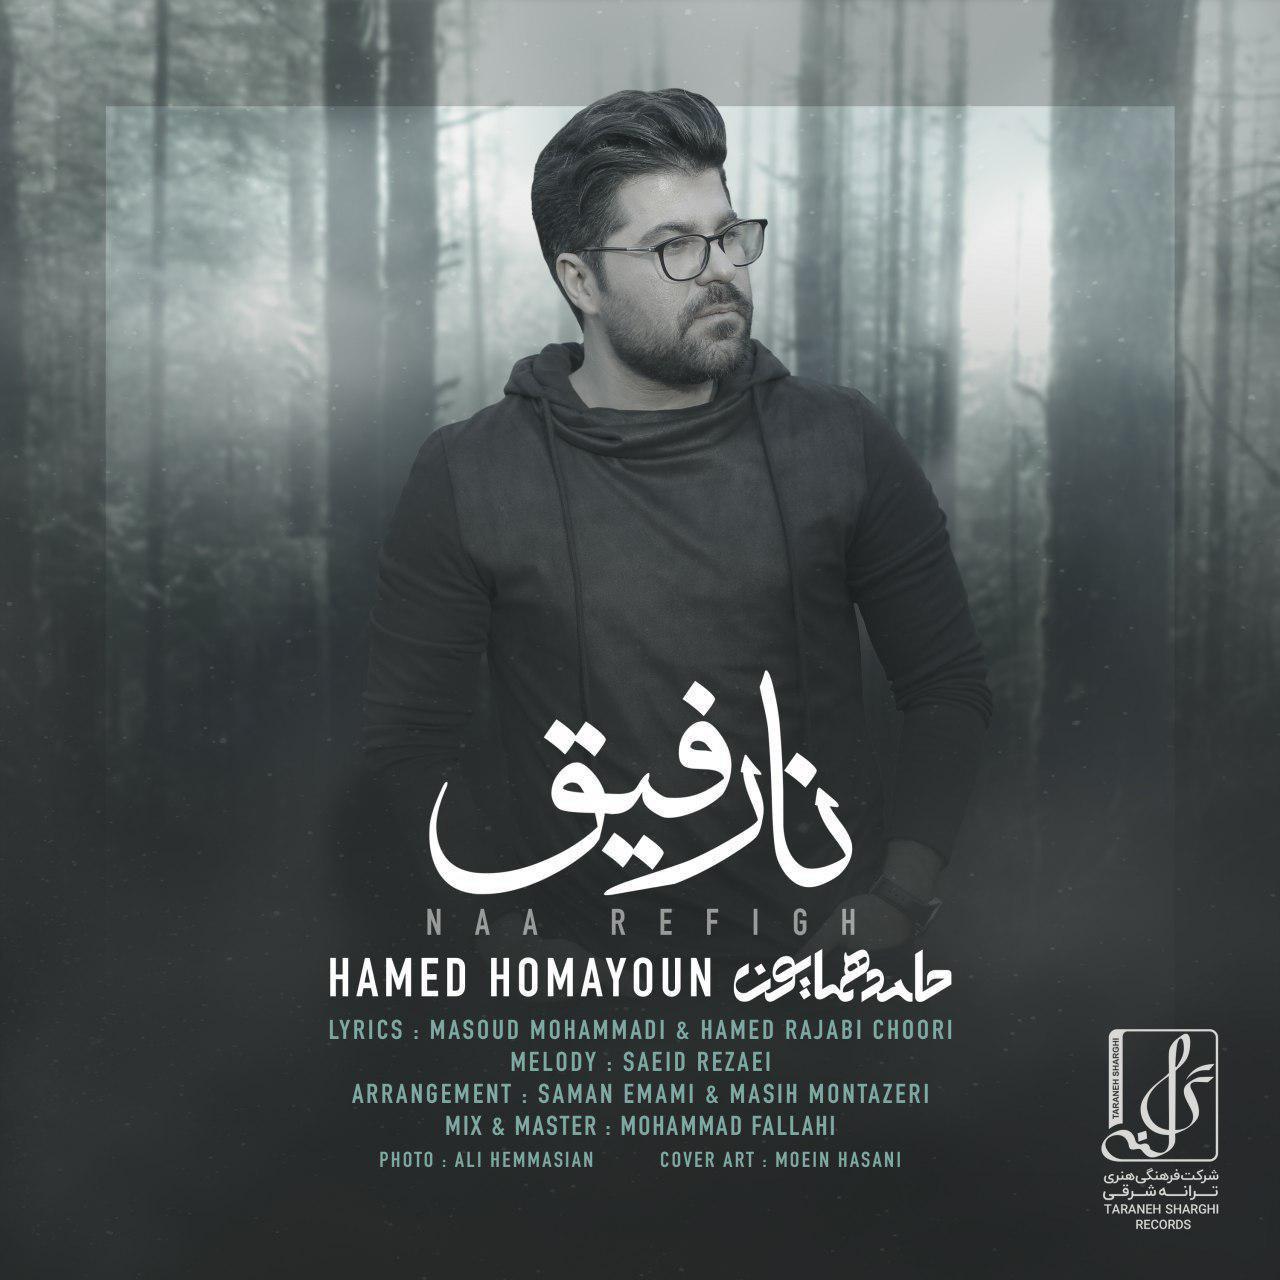 Hamed Homayoun - Narefigh - دانلود آهنگ حامد همایون به نام نارفیق